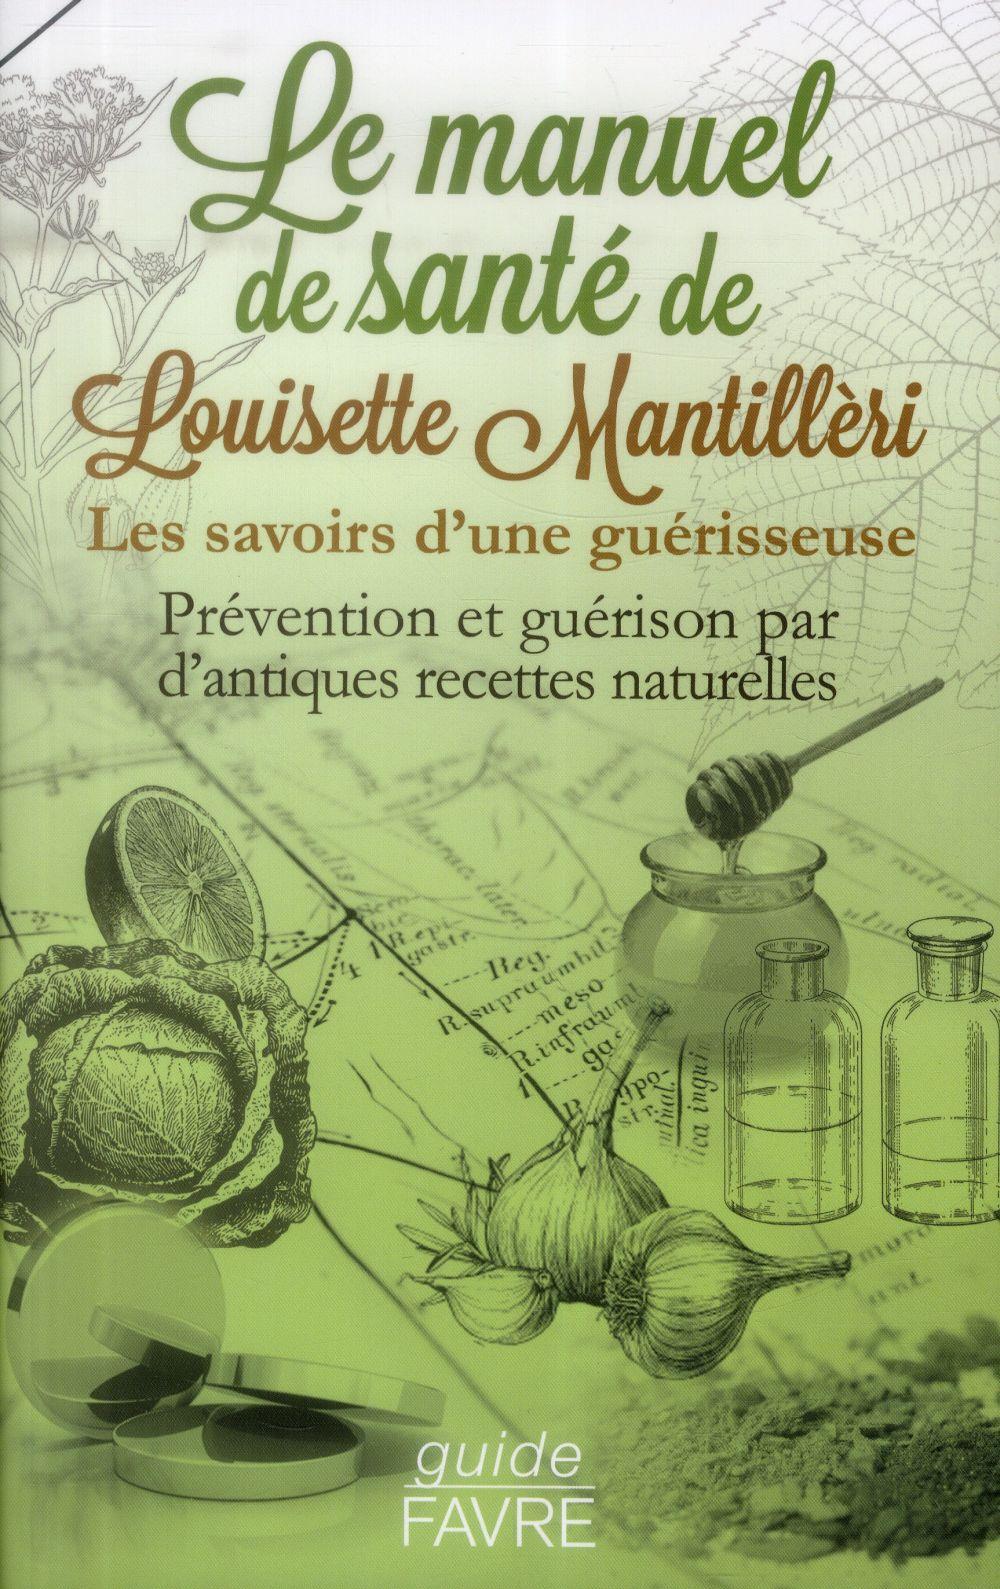 LE MANUEL SANTE DE LOUISETTE MANTILLERI